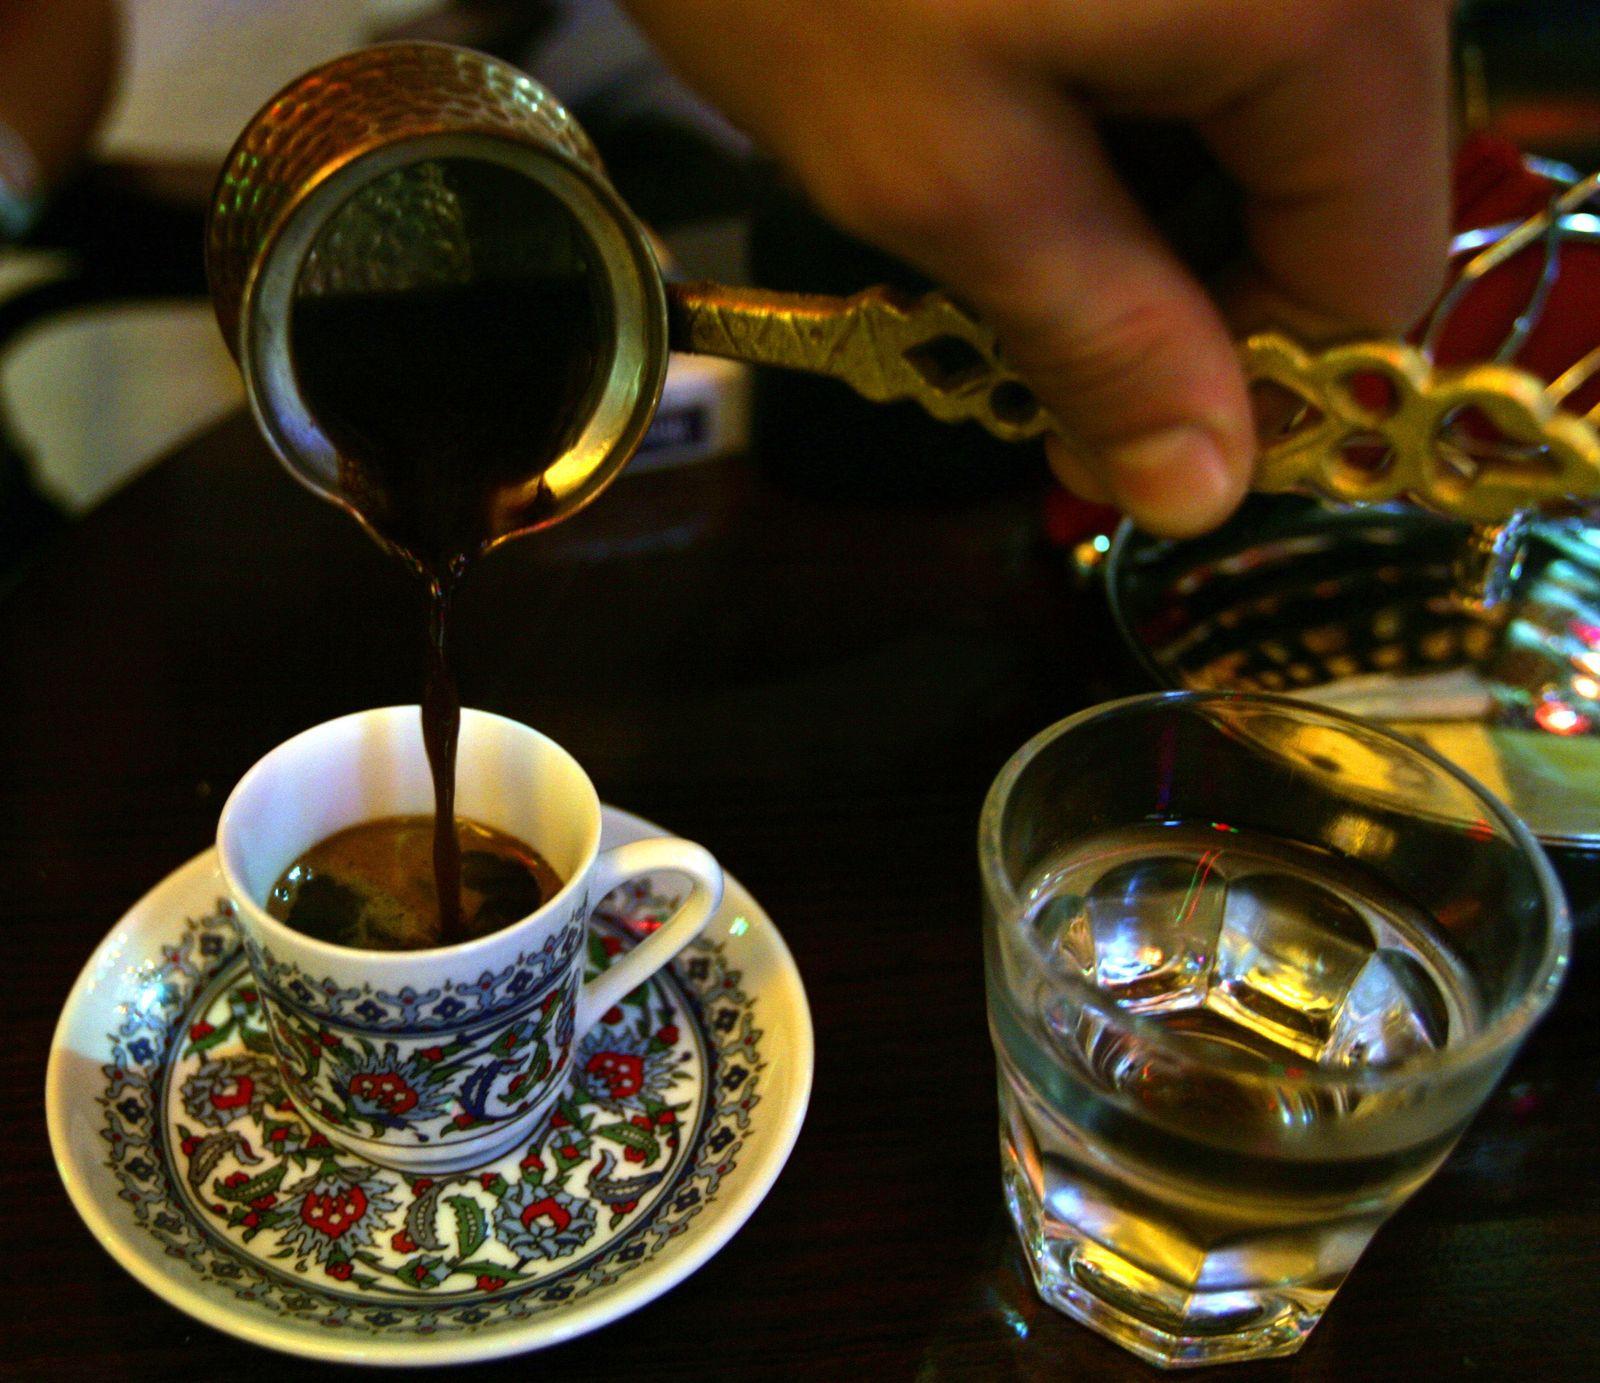 Städtetrip/ Istanbul/ Türkischer Kaffee/ Mokka